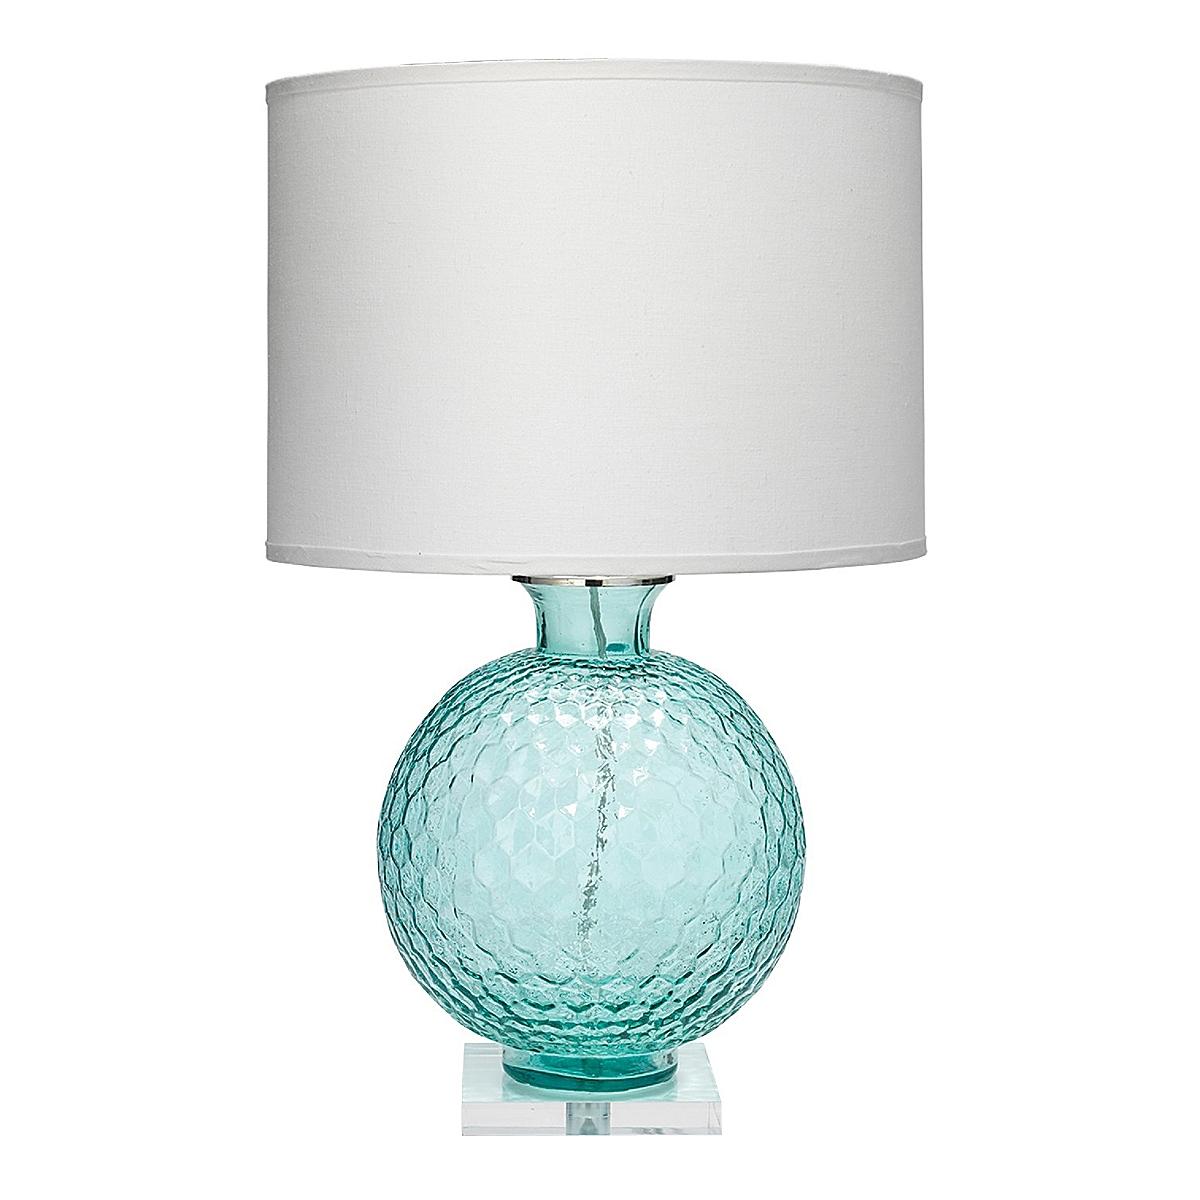 Clark Table Lamp - Aqua